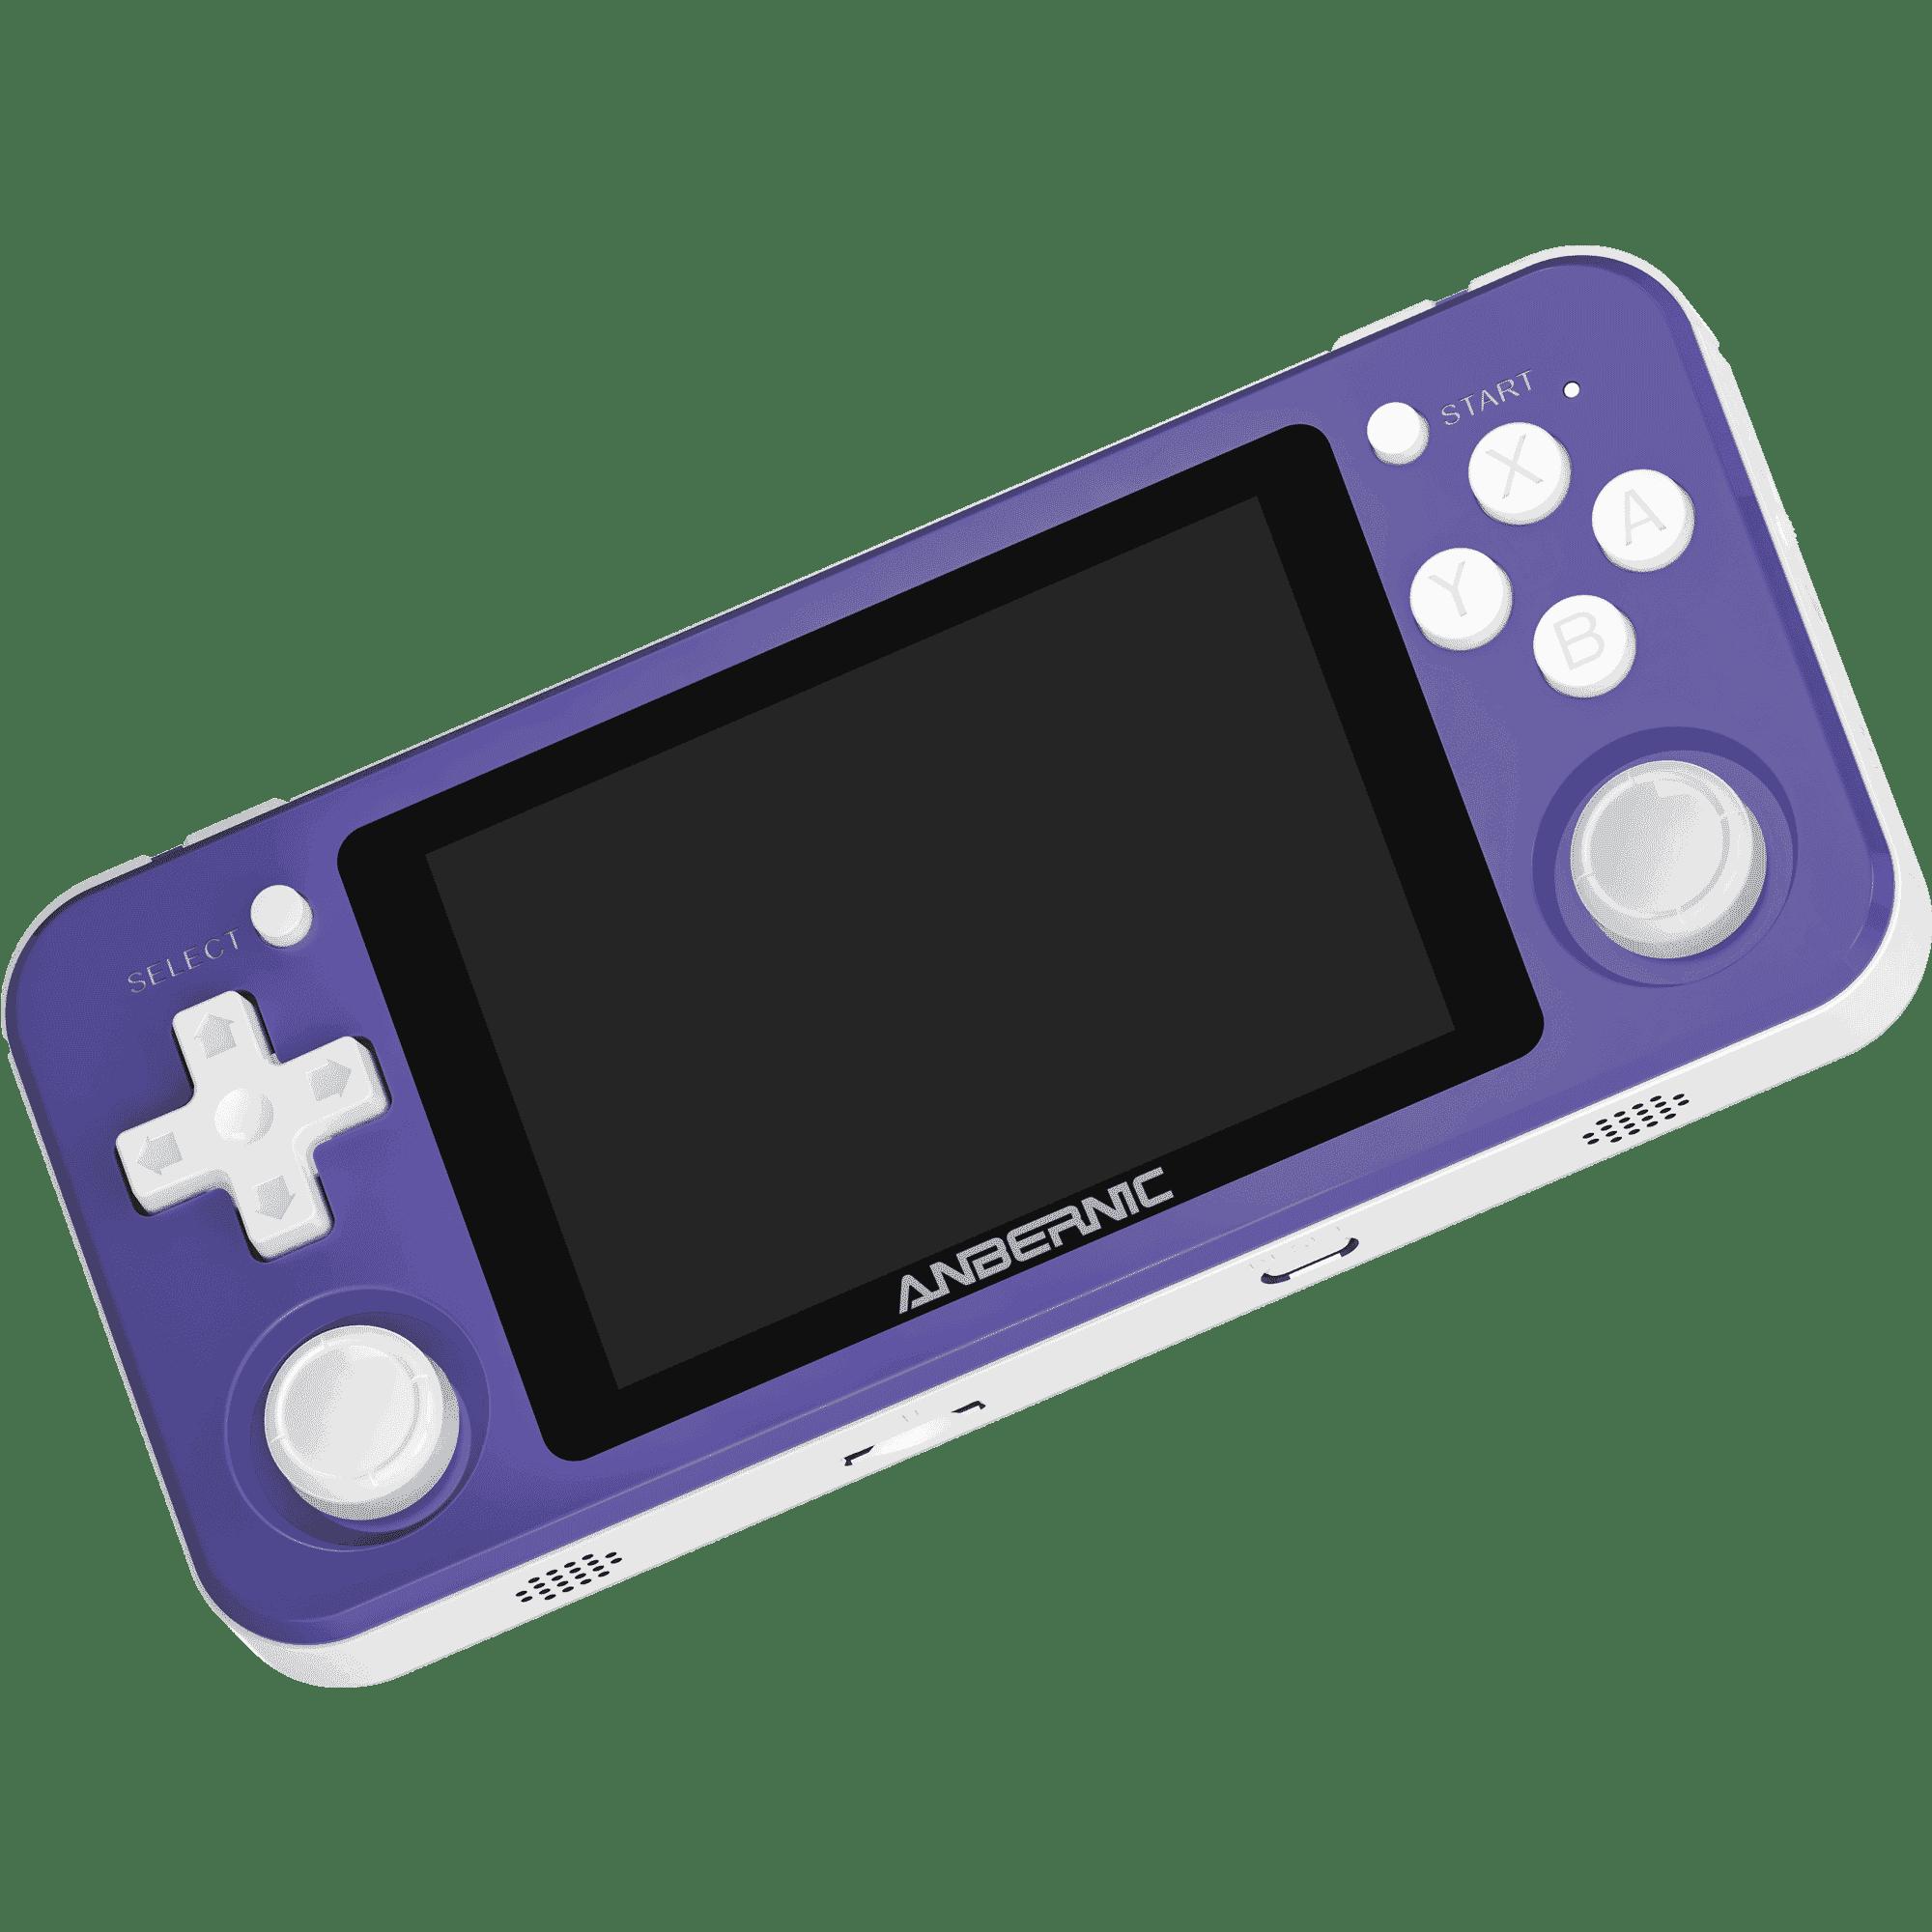 RG351P Purple Retro Gaming Emulator - Showing Front at angle